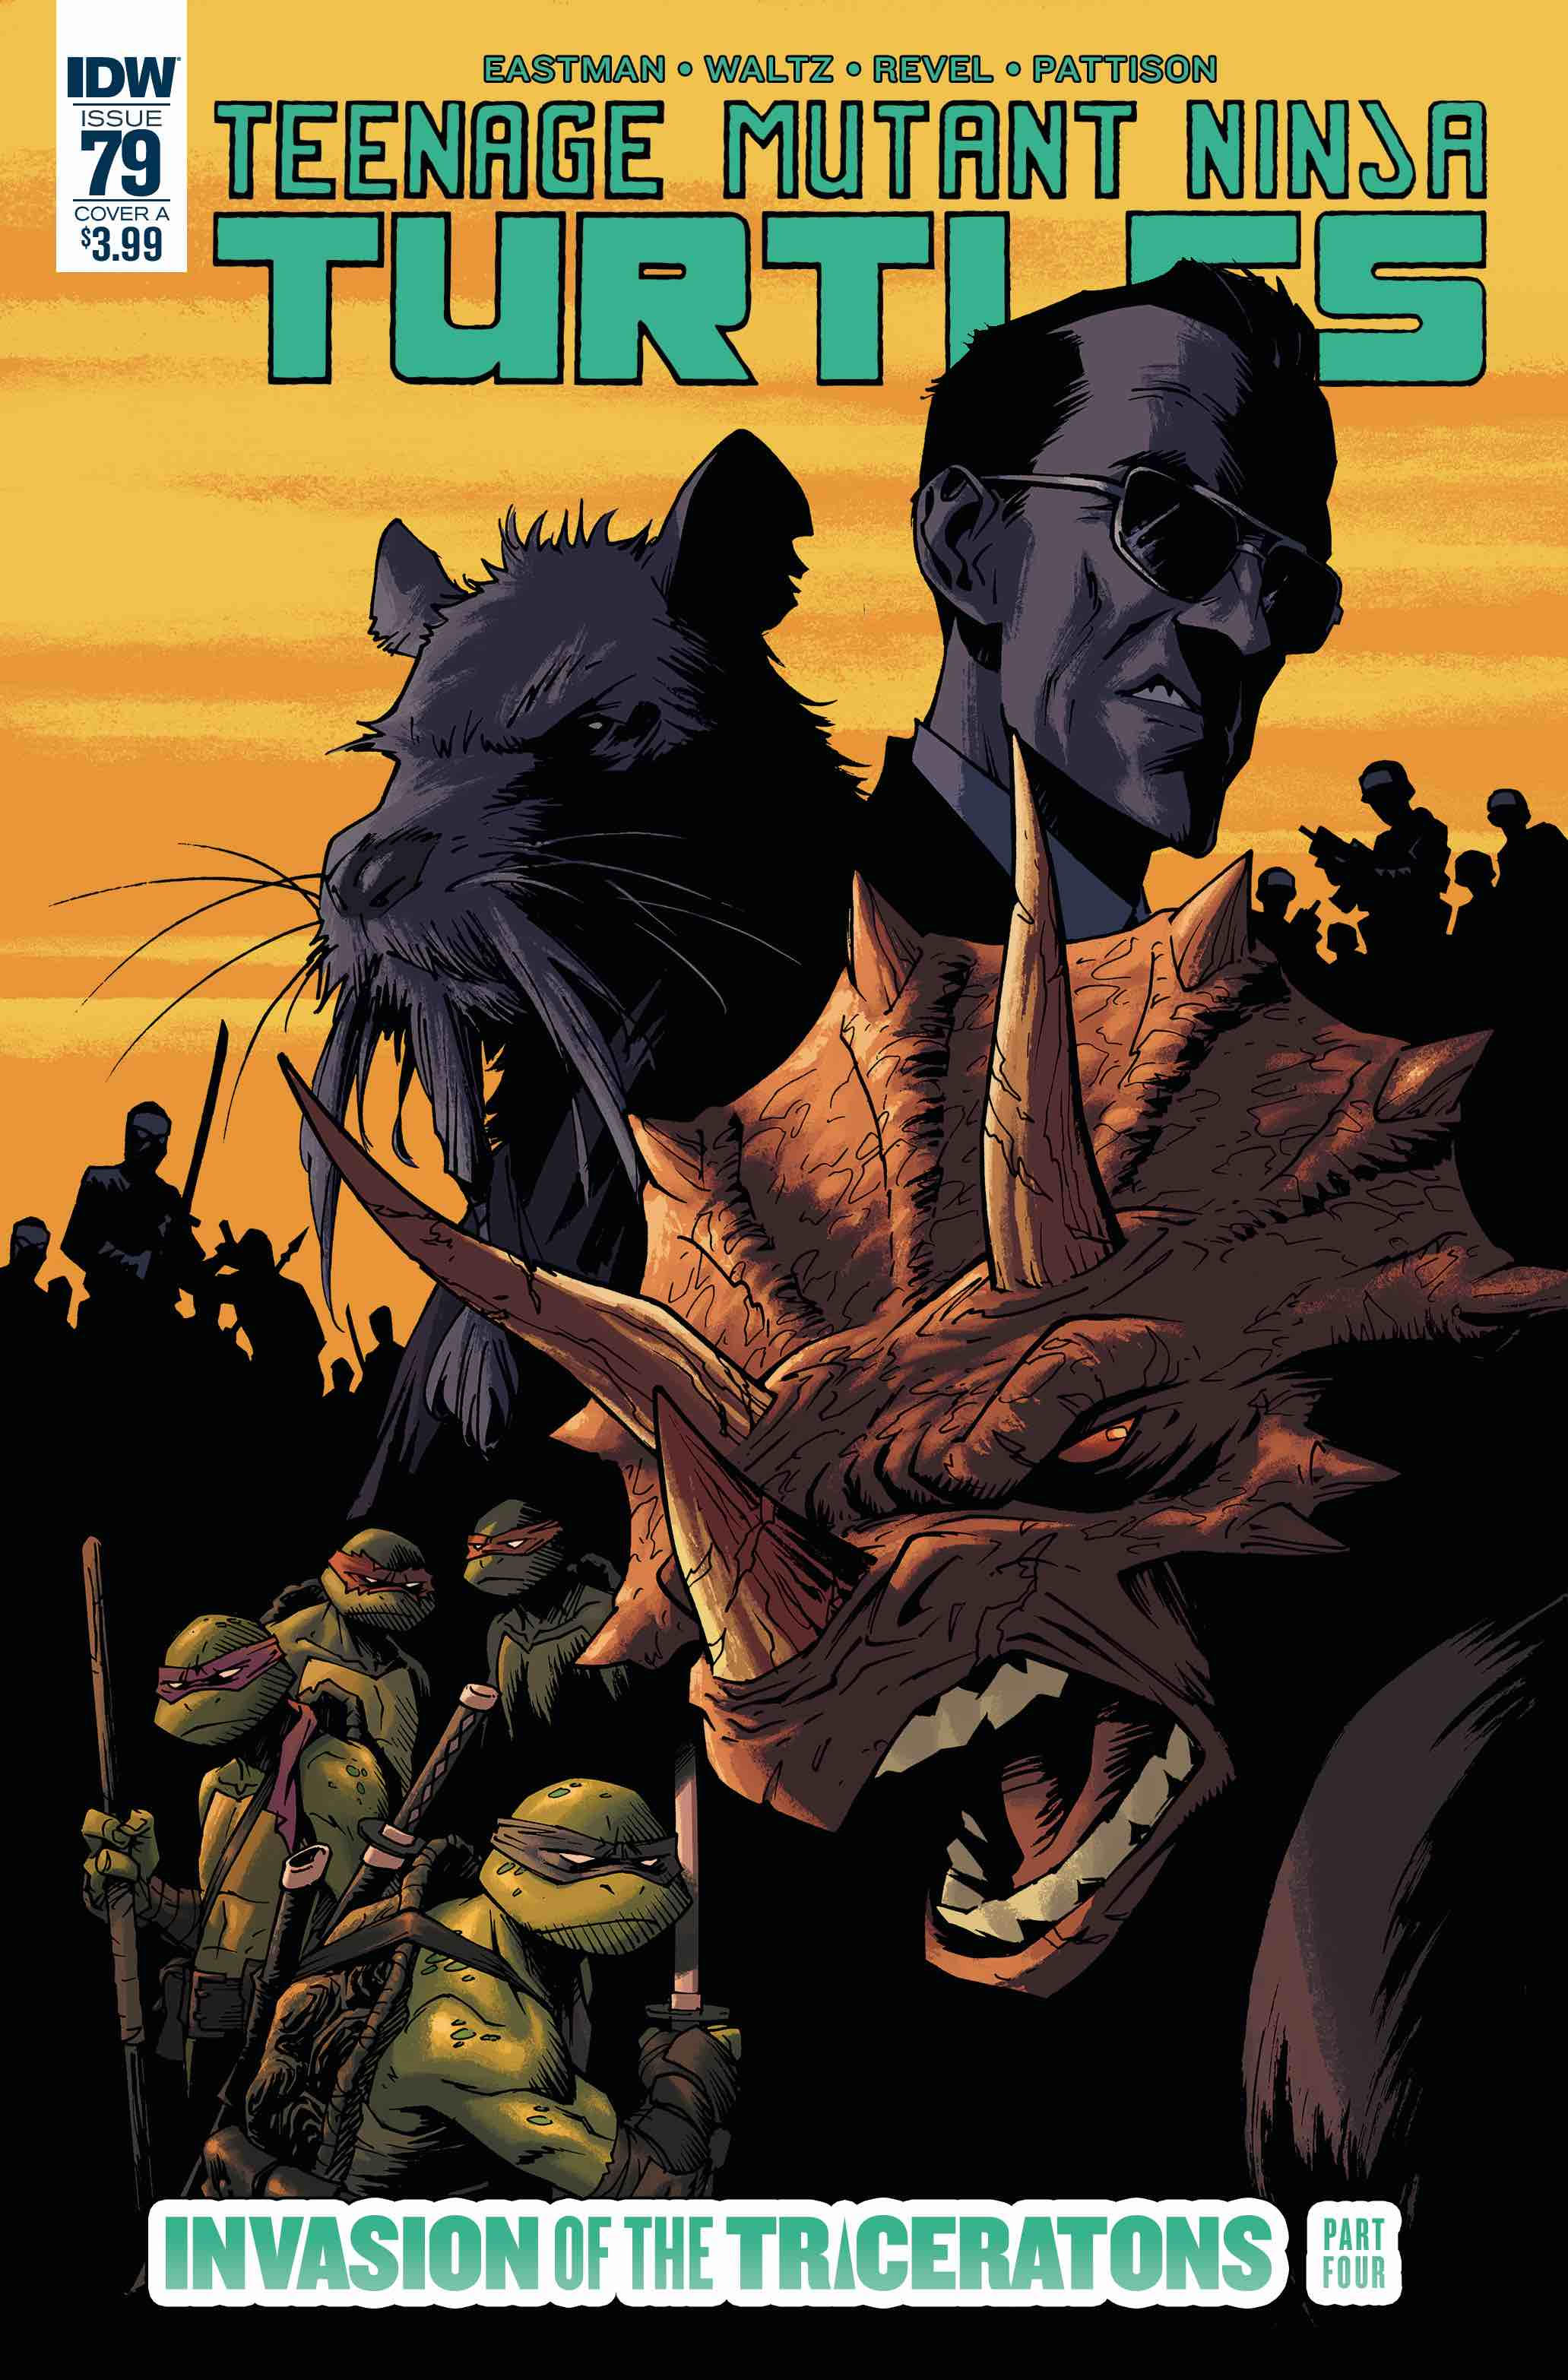 Teenage Mutant Ninja Turtles #79 Review